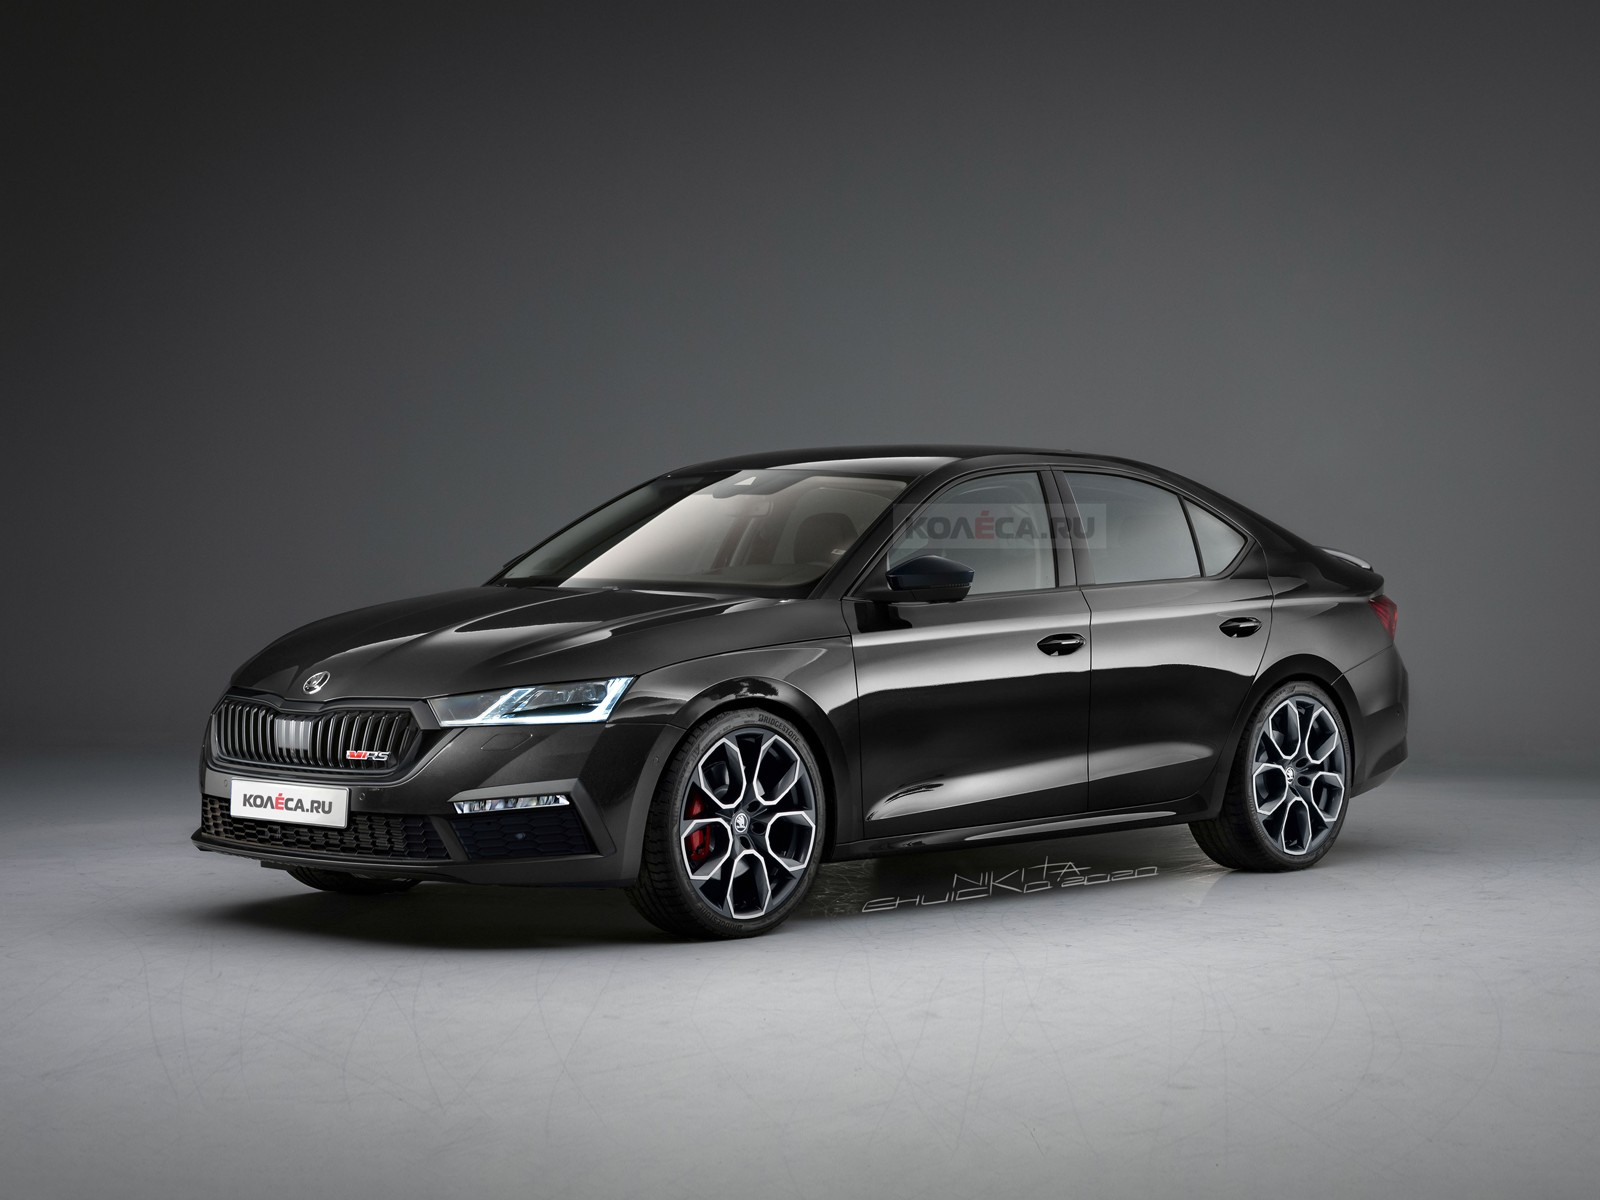 2021 skoda octavia rs will look classy could go hybrid